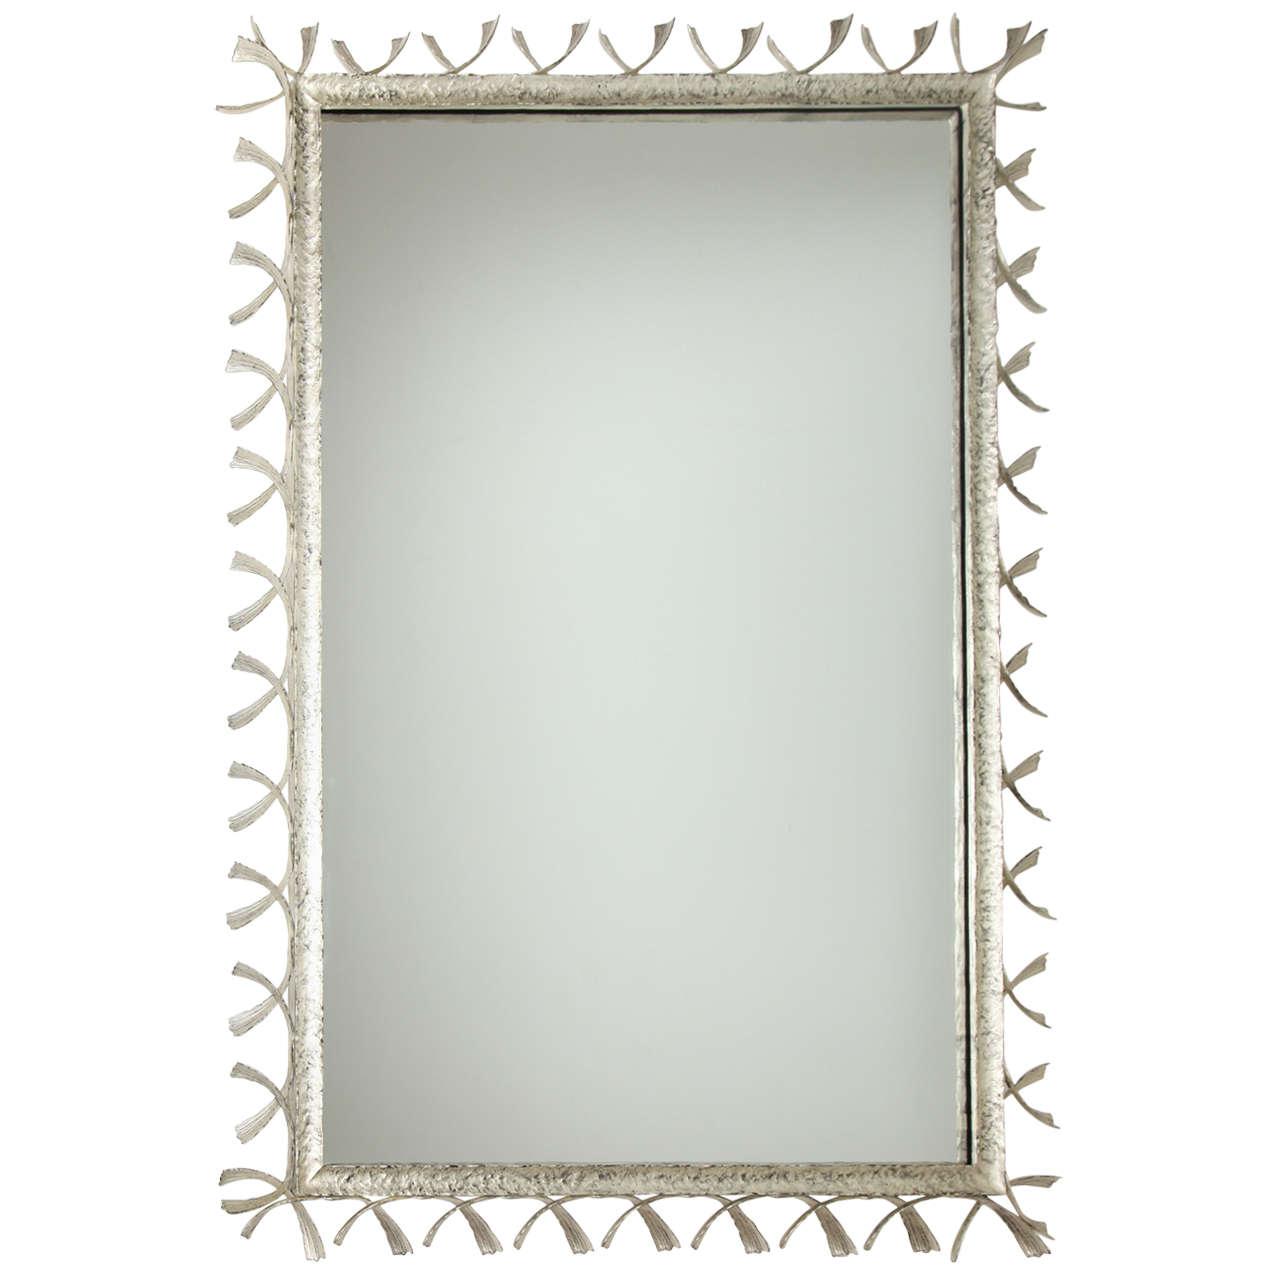 "William P. Sullivan,""La Mer"", Unique Bronze Mirror, USA, 2011 1"